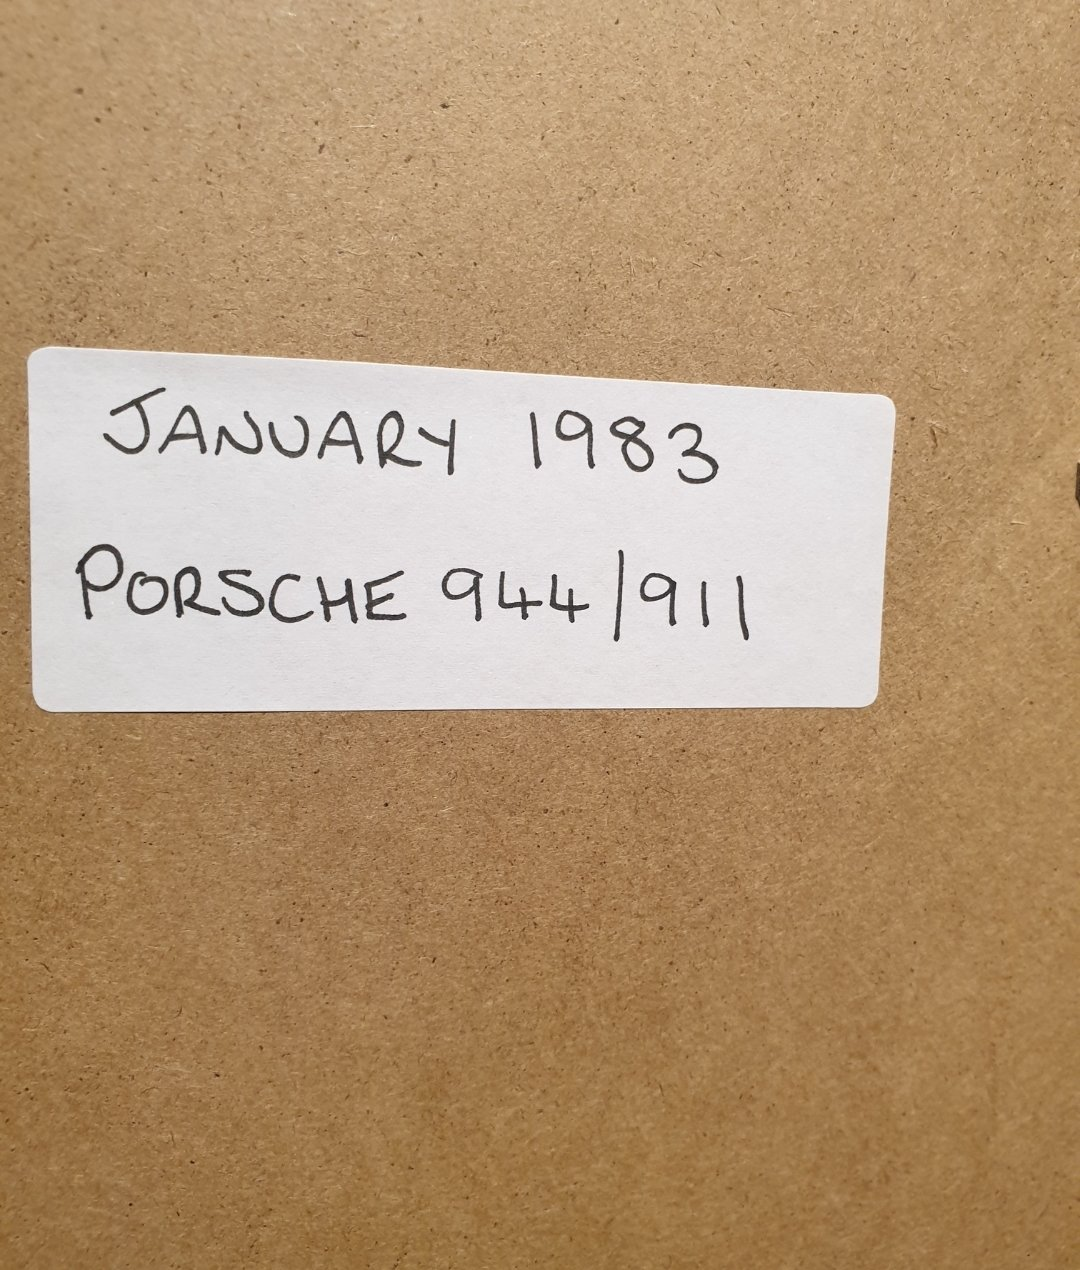 1983 Porsche Framed Advert Original  For Sale (picture 2 of 2)